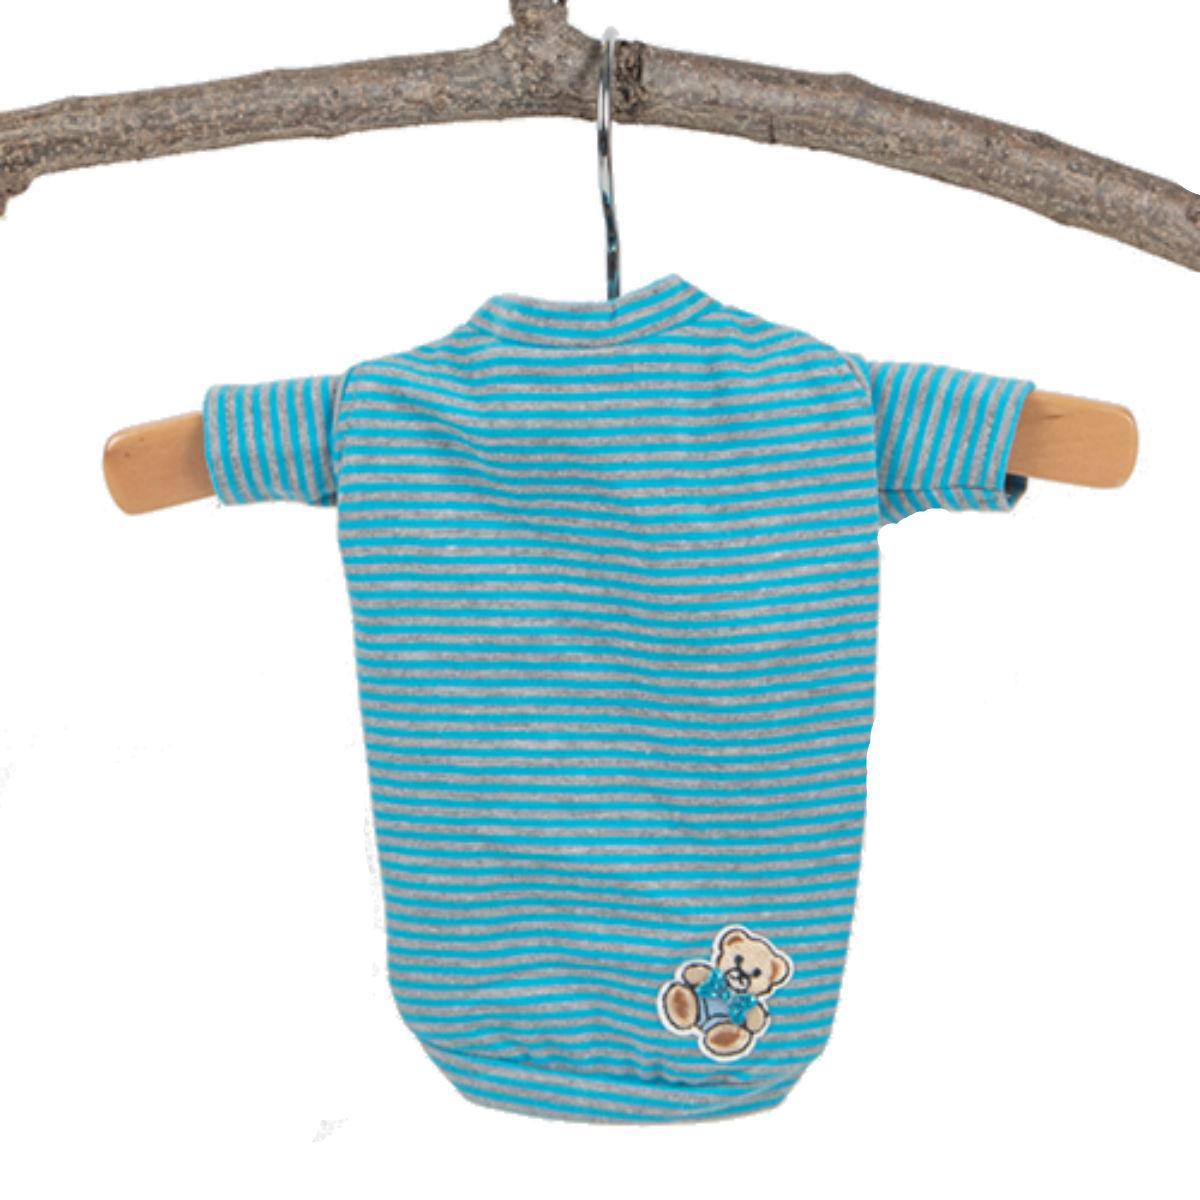 Hello Doggie Candy Striped Dog Shirt - Blue